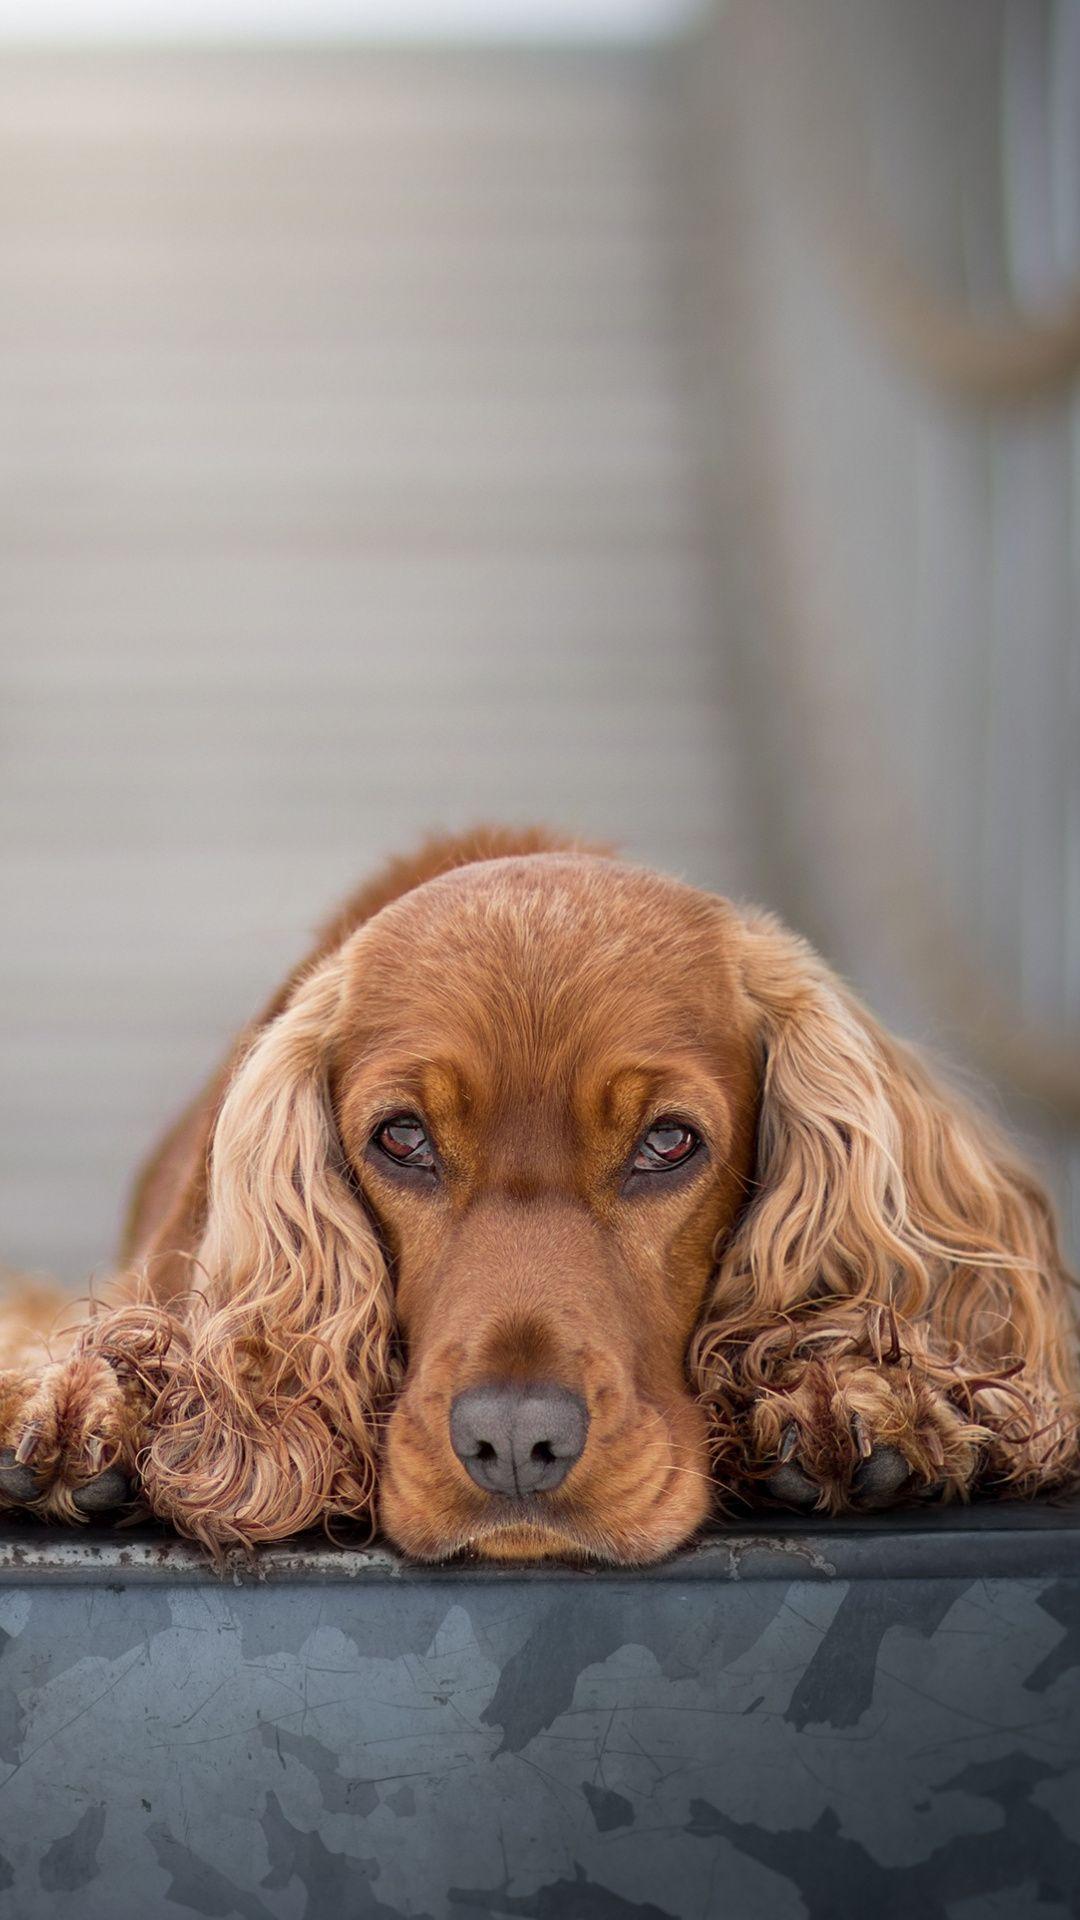 Downaload Cocker Spaniel, cute, muzzle wallpaper for